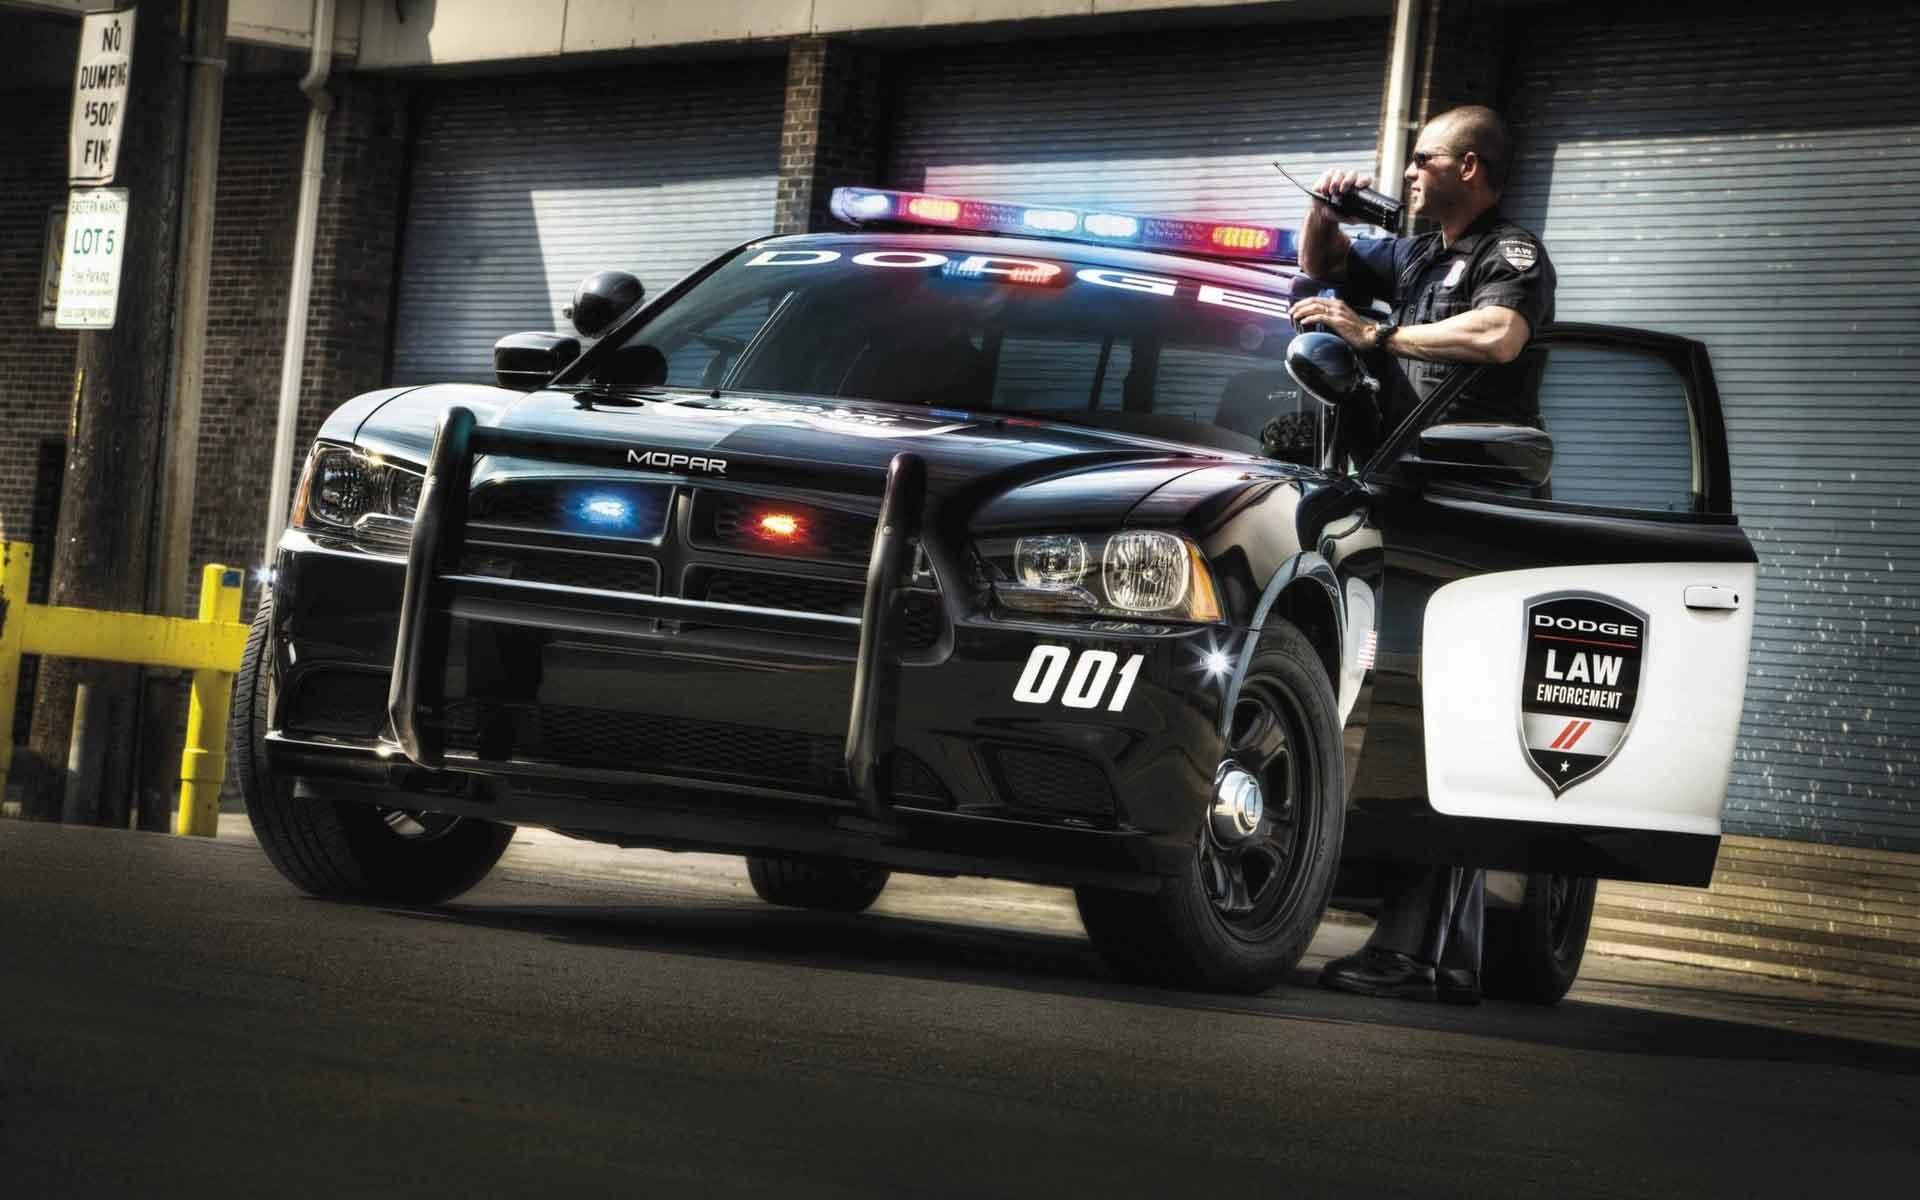 Police Wallpaper for My Desktop | HD Wallpapers | Pinterest | Hd wallpaper,  Wallpaper and Wallpaper backgrounds